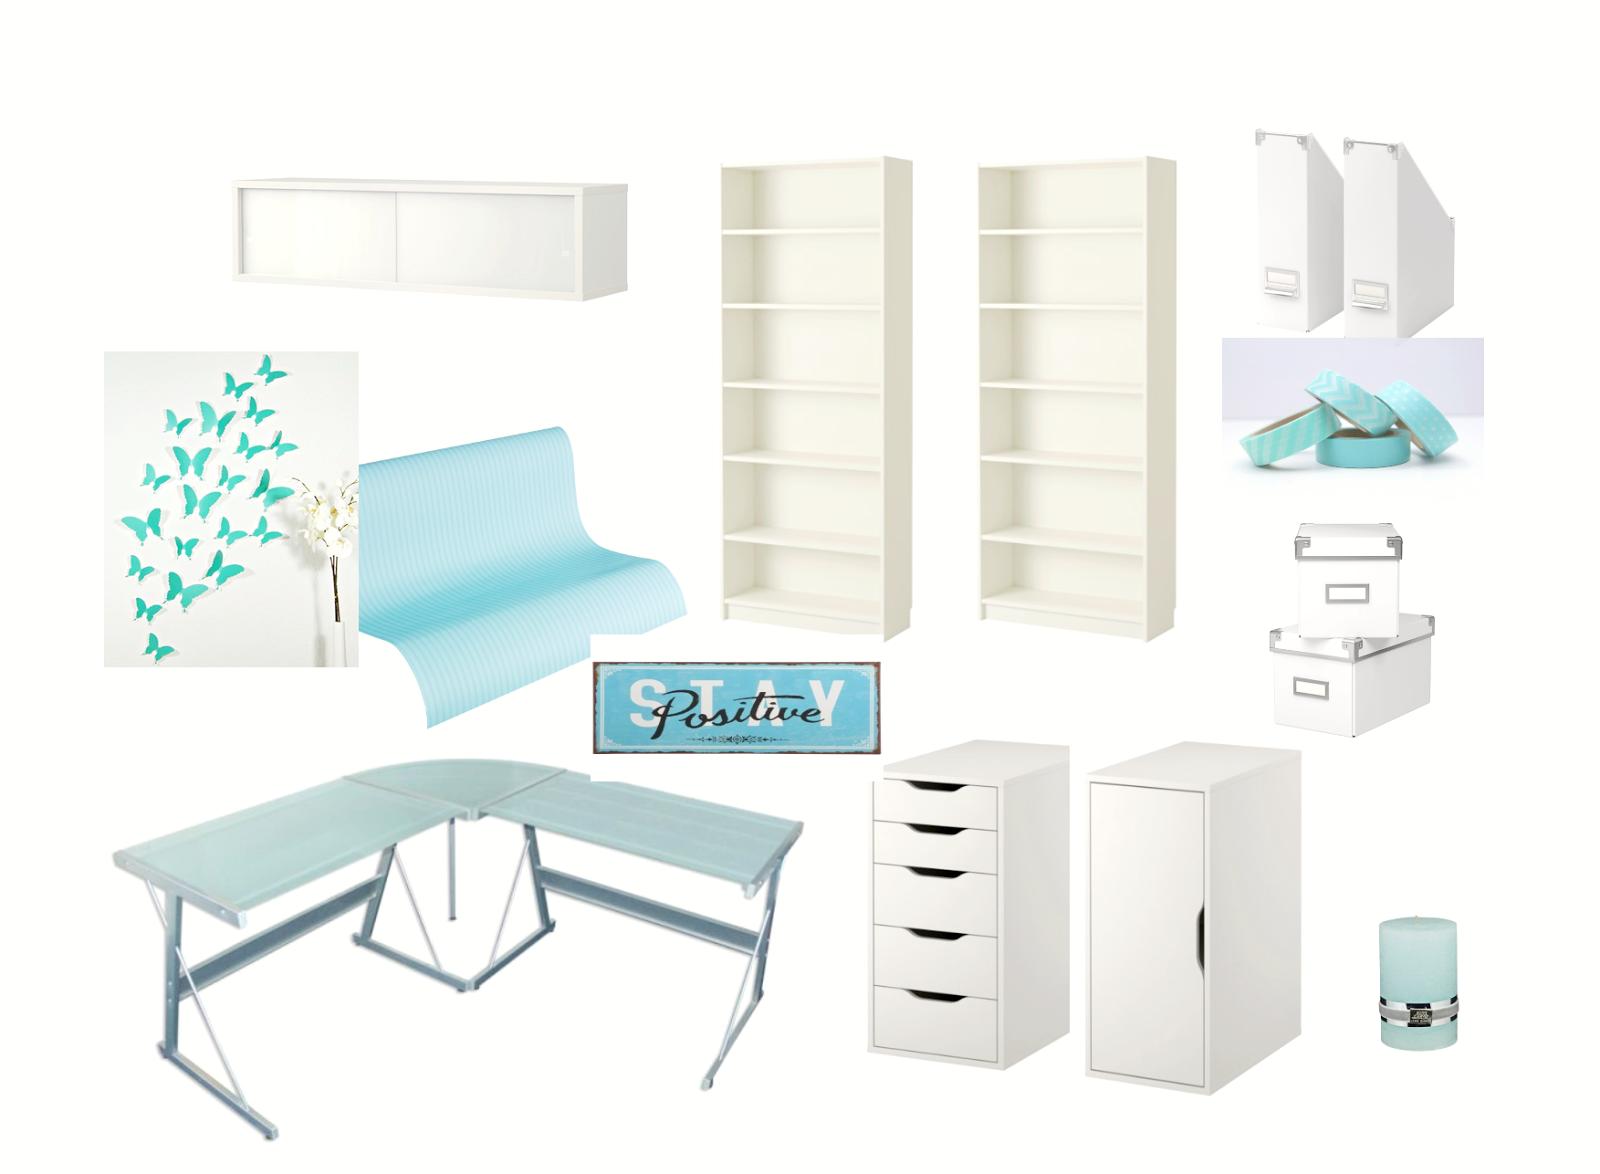 Villa Lebenslust Blog: Moodboard - Home Office Gestaltung Türkis - Weiss